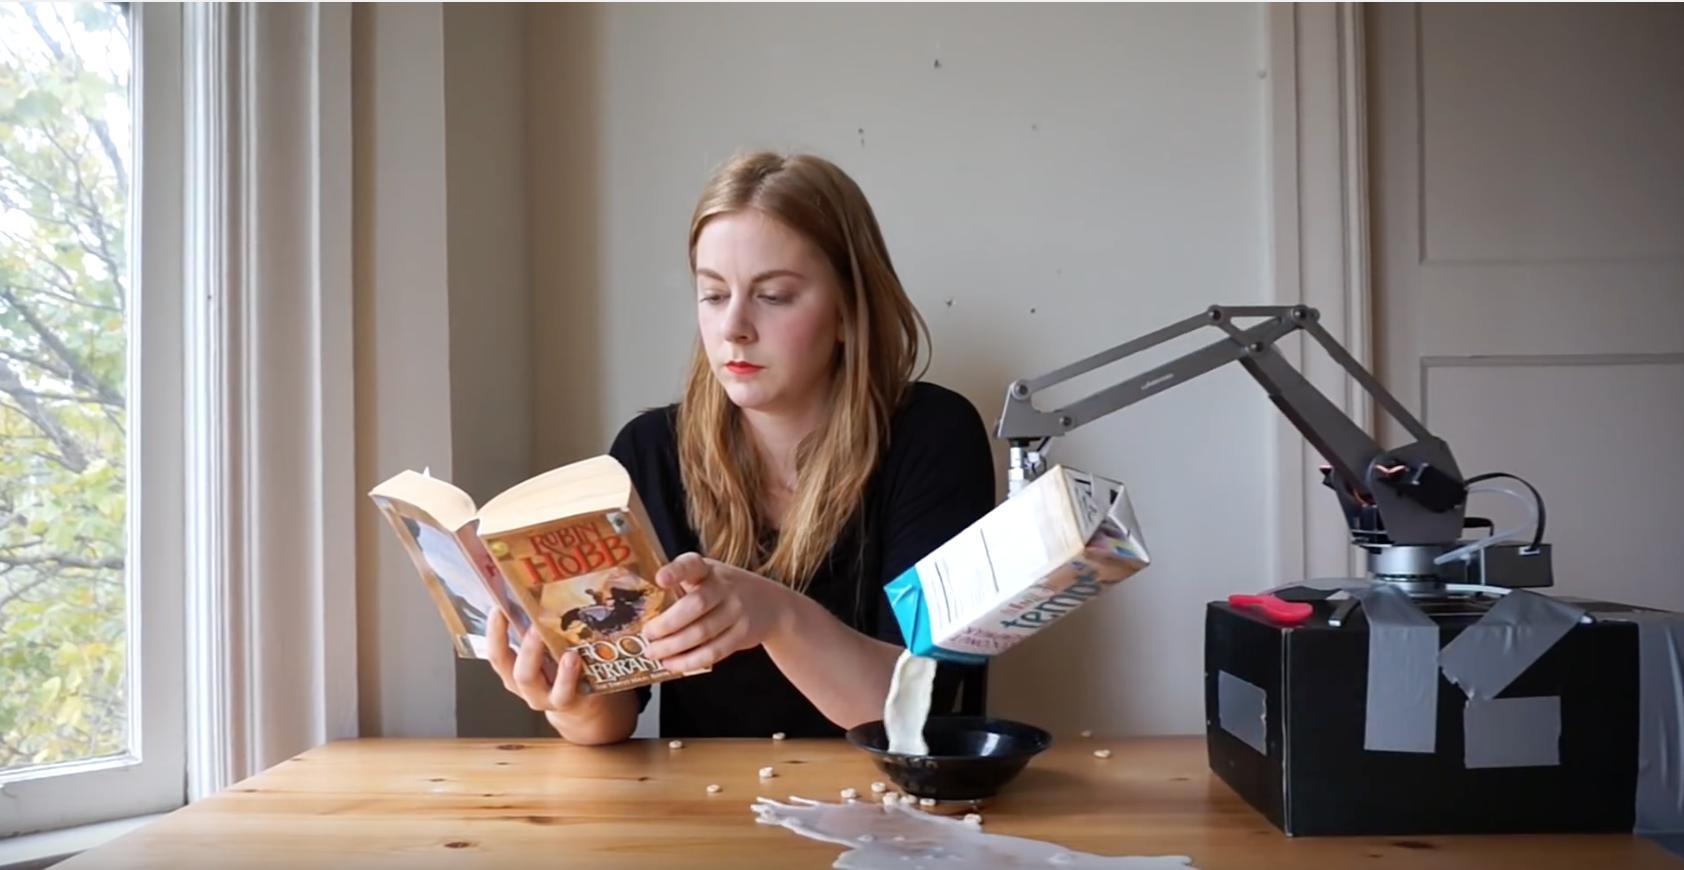 Simone Giertz robot cereal